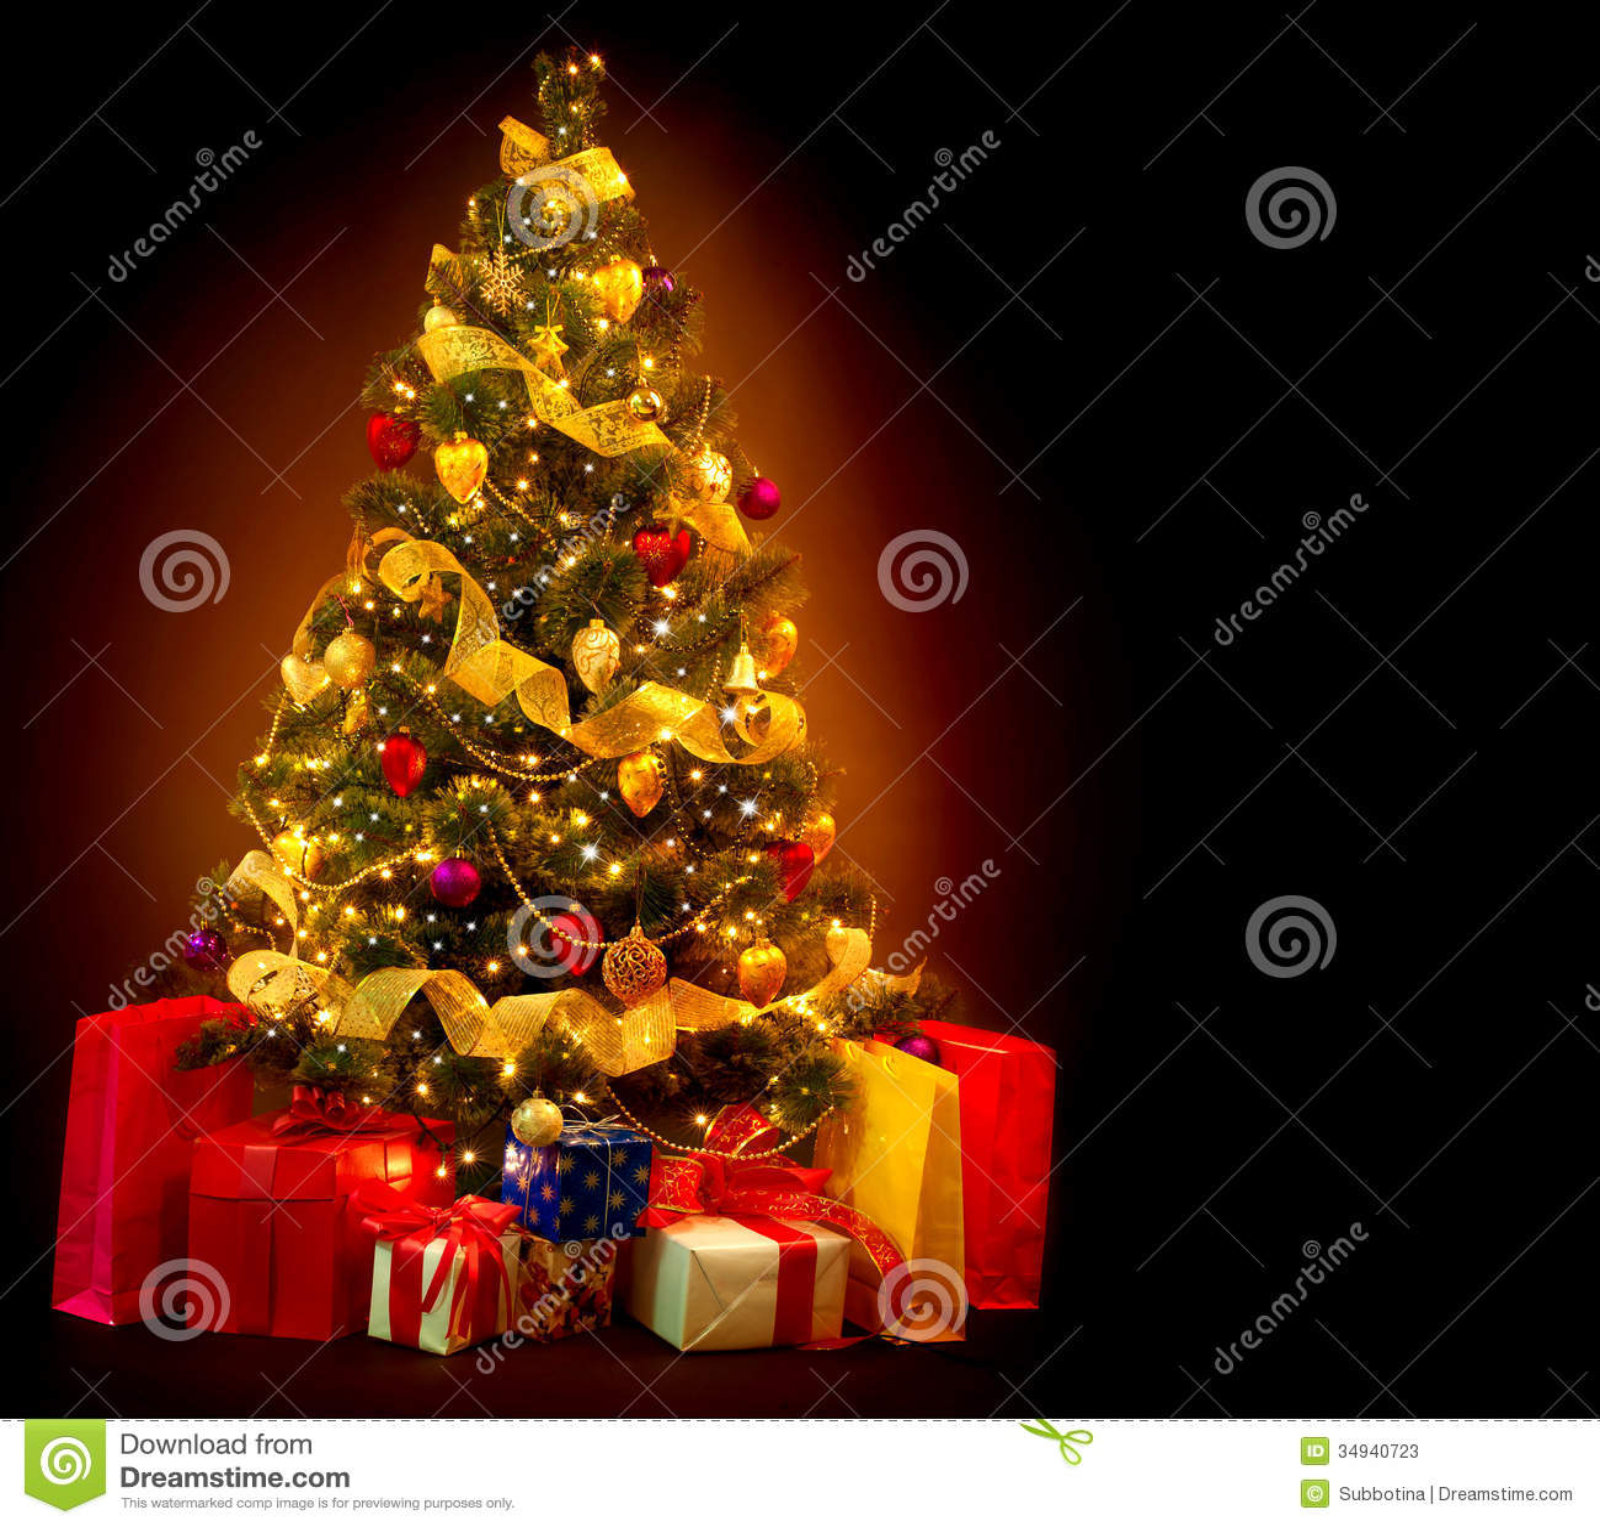 Black Bear Christmas Tree